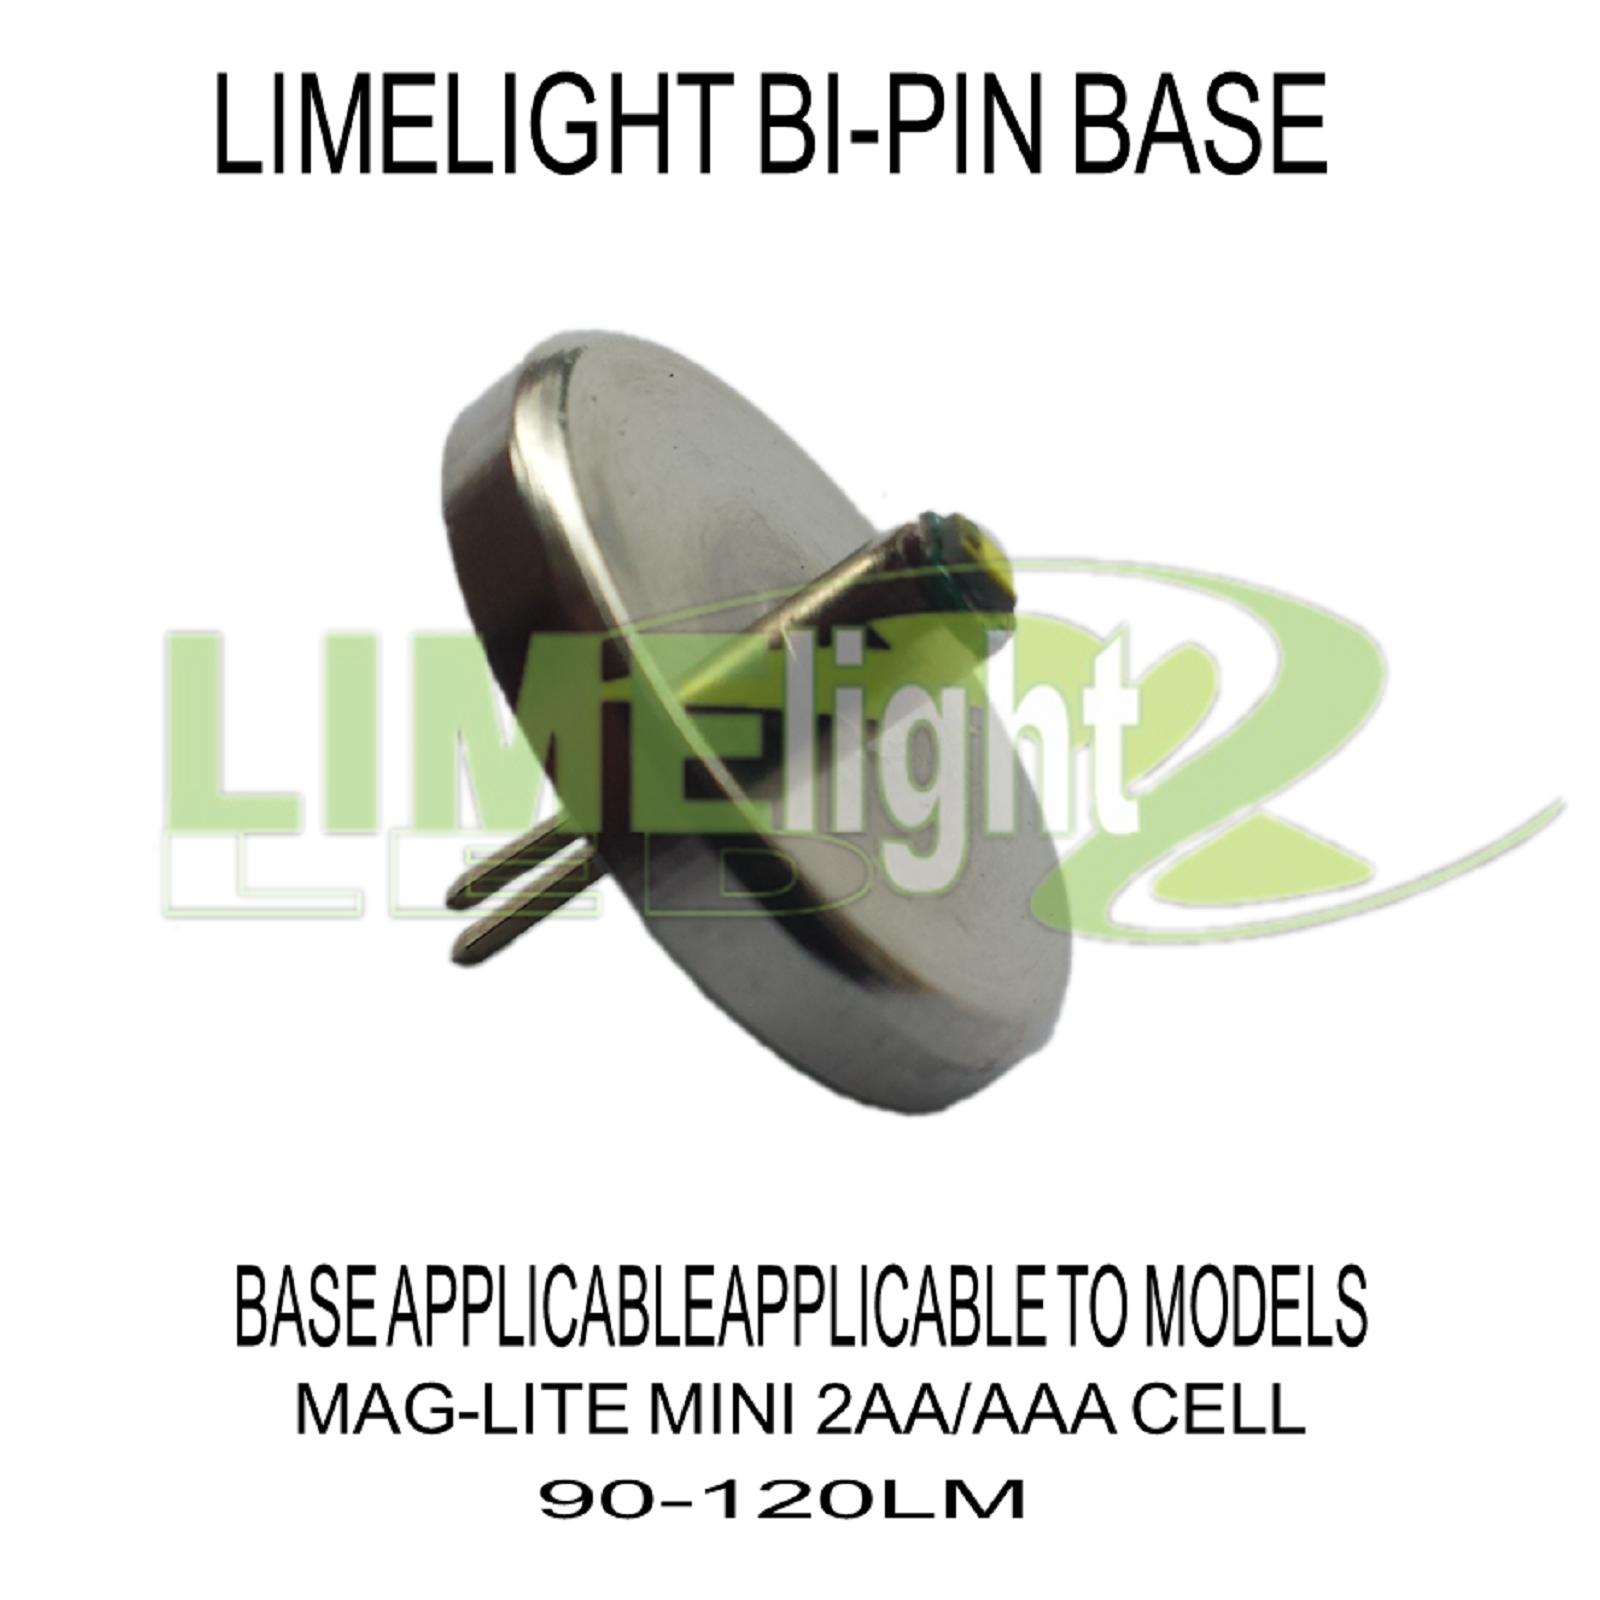 Maglite Led Upgrade Conversion Cree 1W-10W Bulb Globe Flashlight Torch 90-1100Lm 3